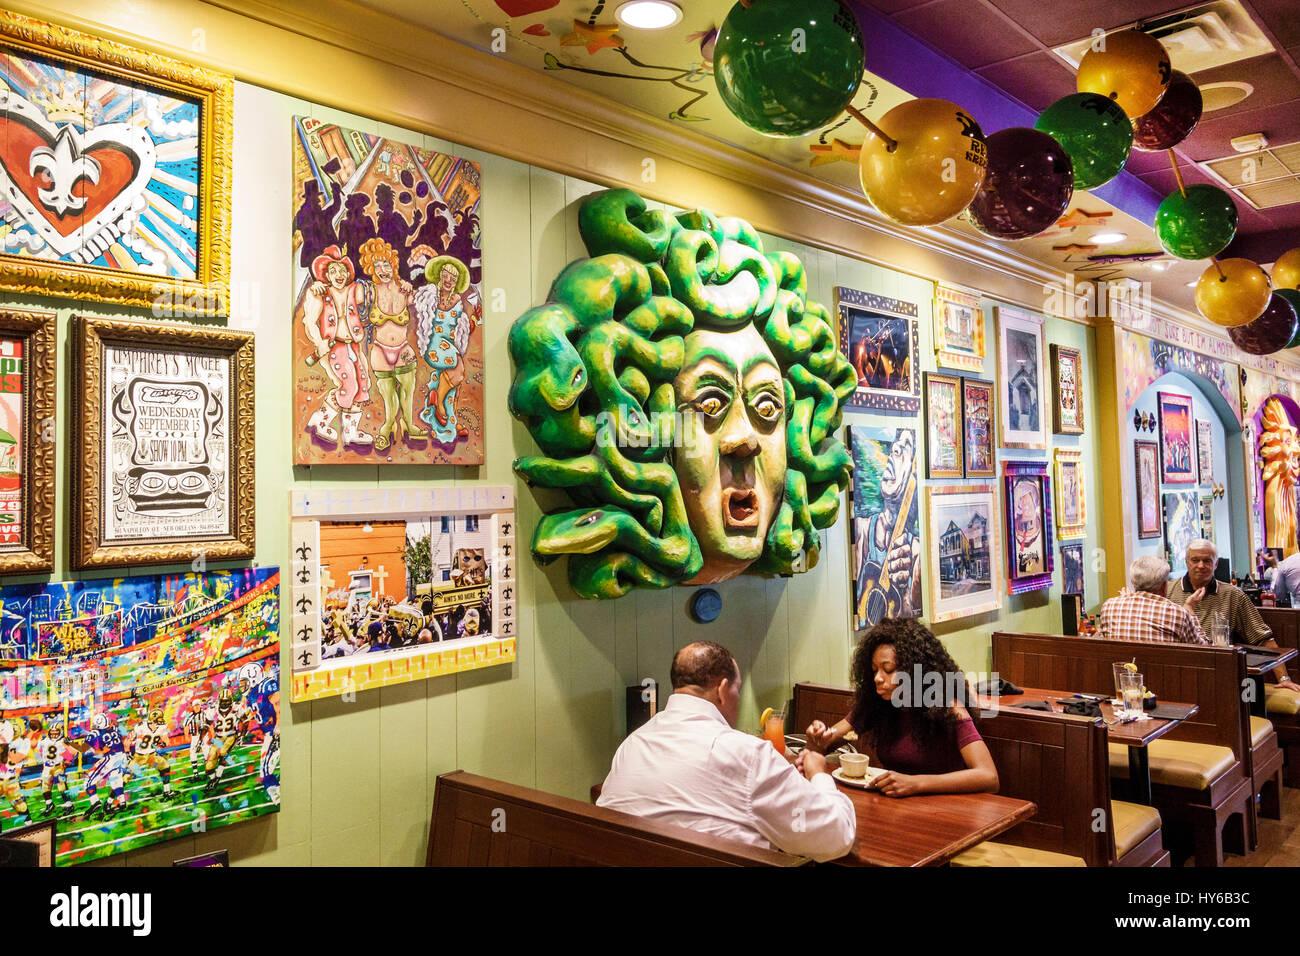 Winter Park Orlando Florida Tibbyu0027s New Orleans Kitchen Restaurant Interior  Carnival Theme Decor Booth Man Black Woman